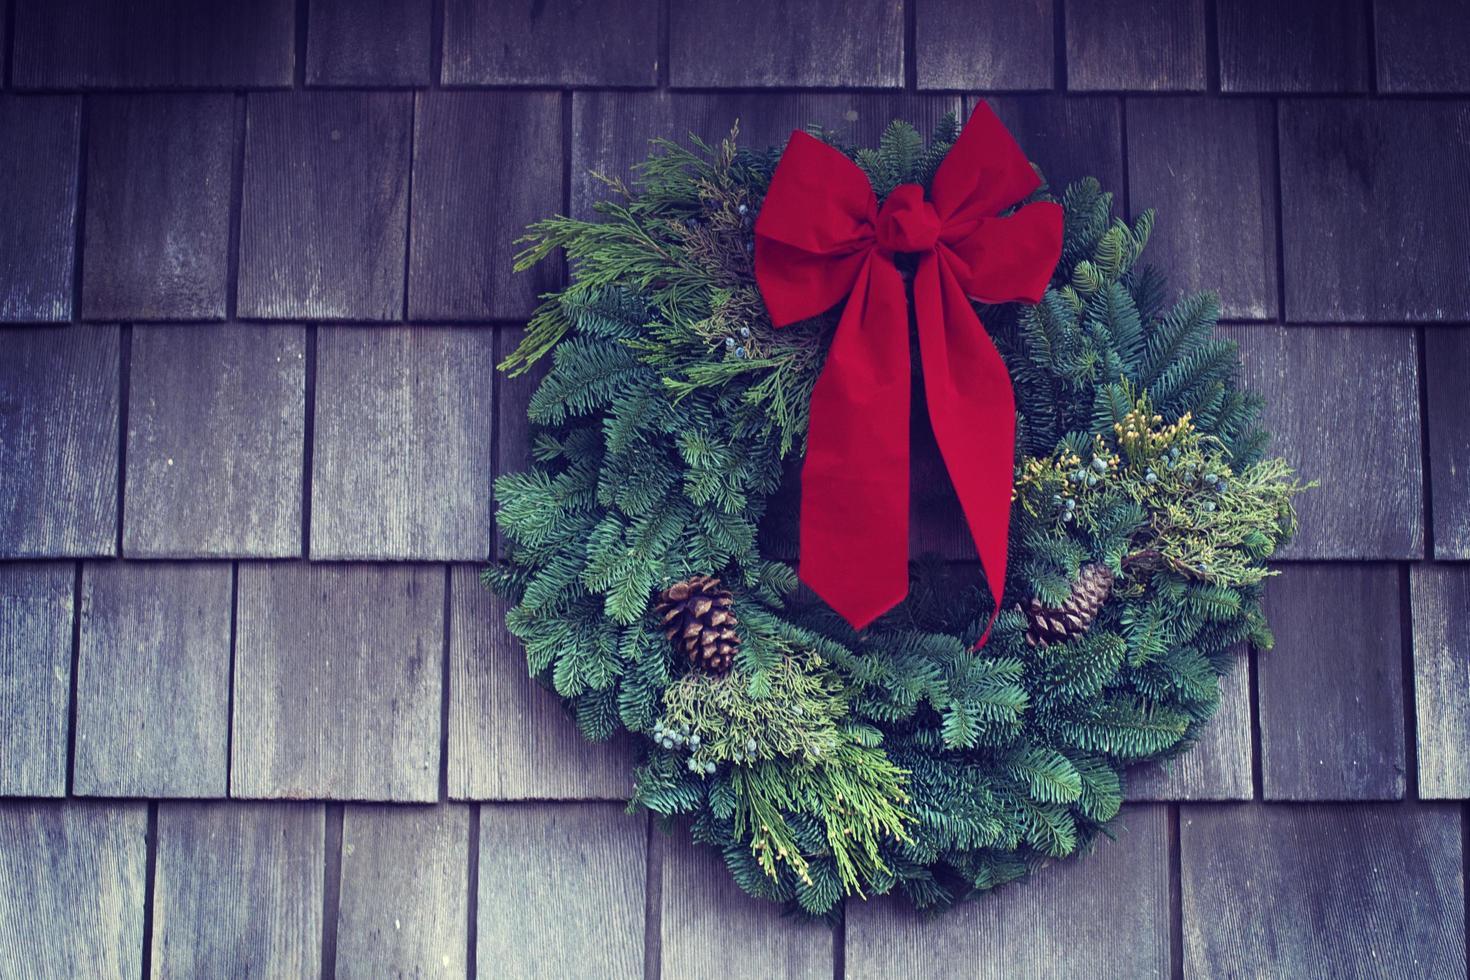 Wreath mounted on wall photo